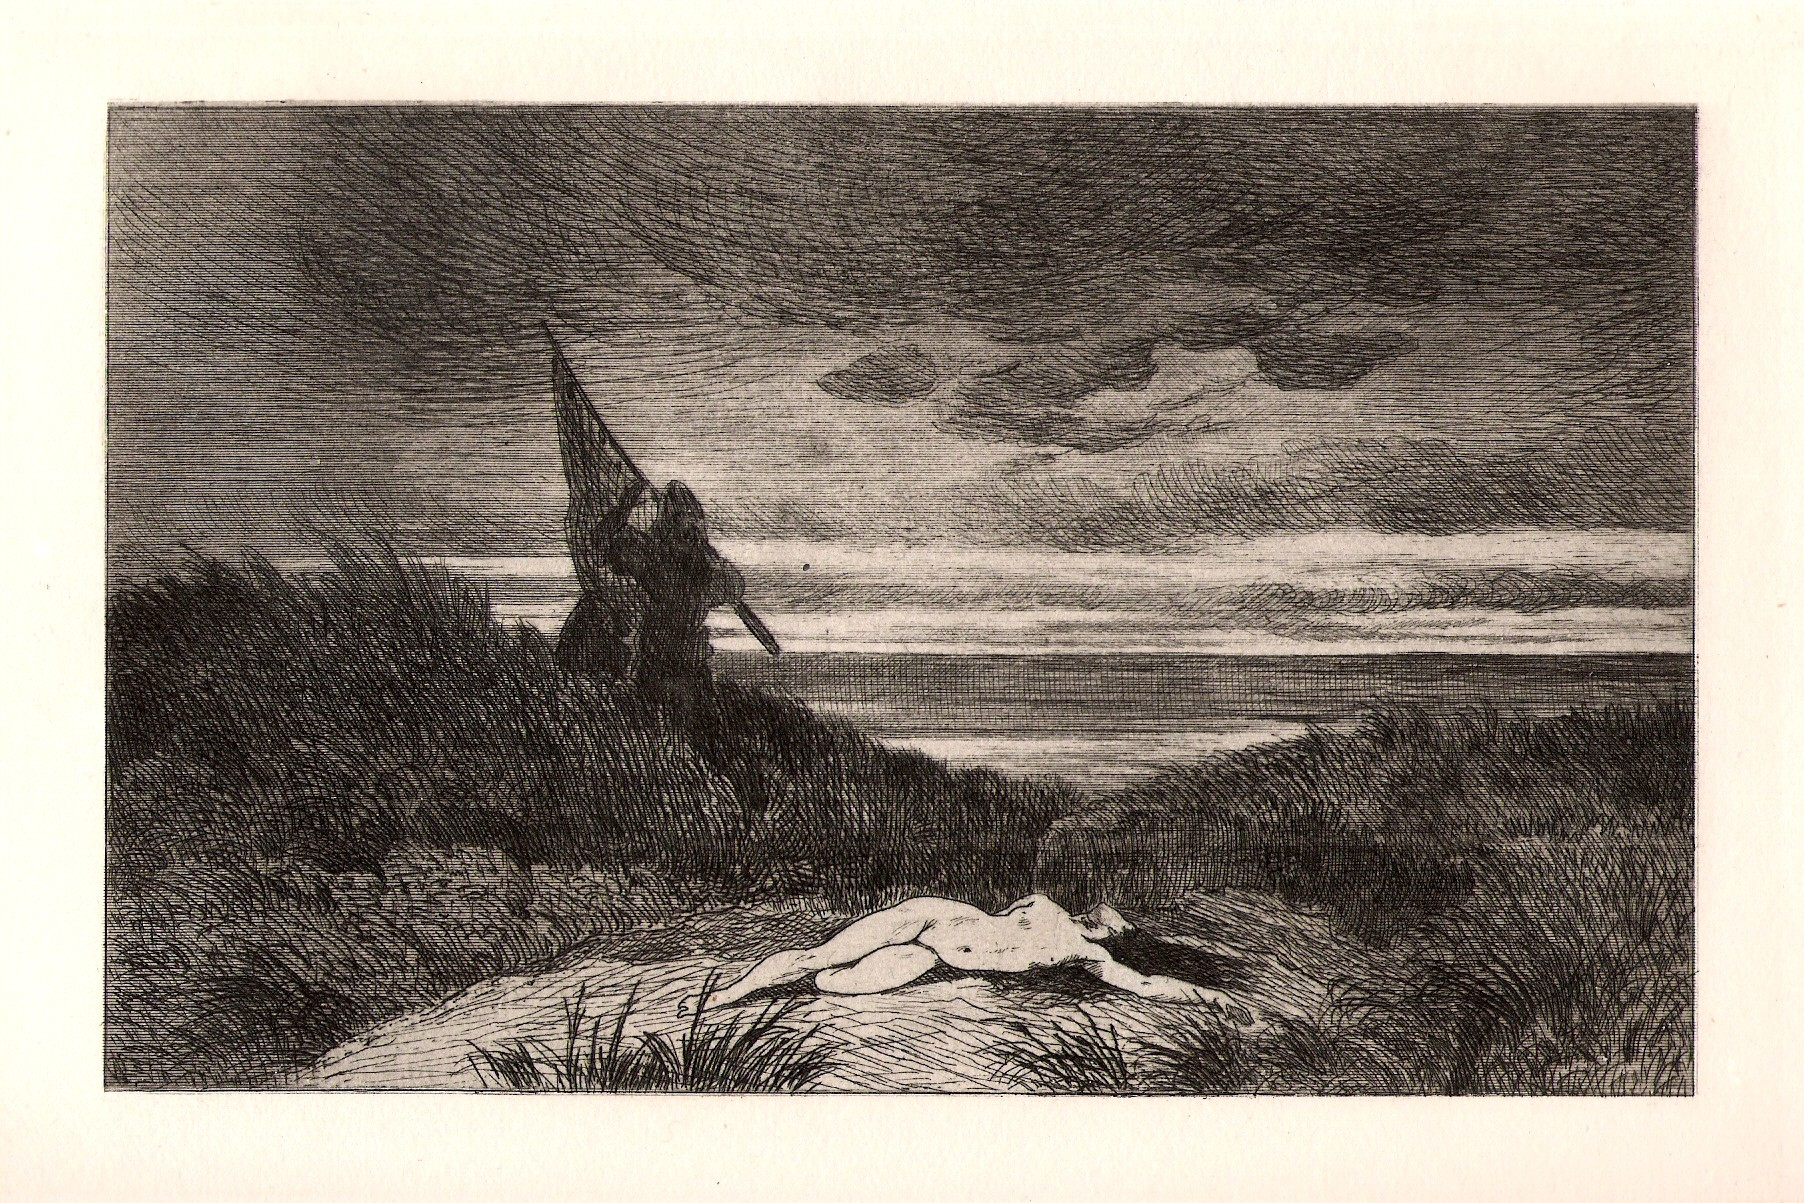 Félicien_Rops_-_Le_Werwolf_-_original_etching